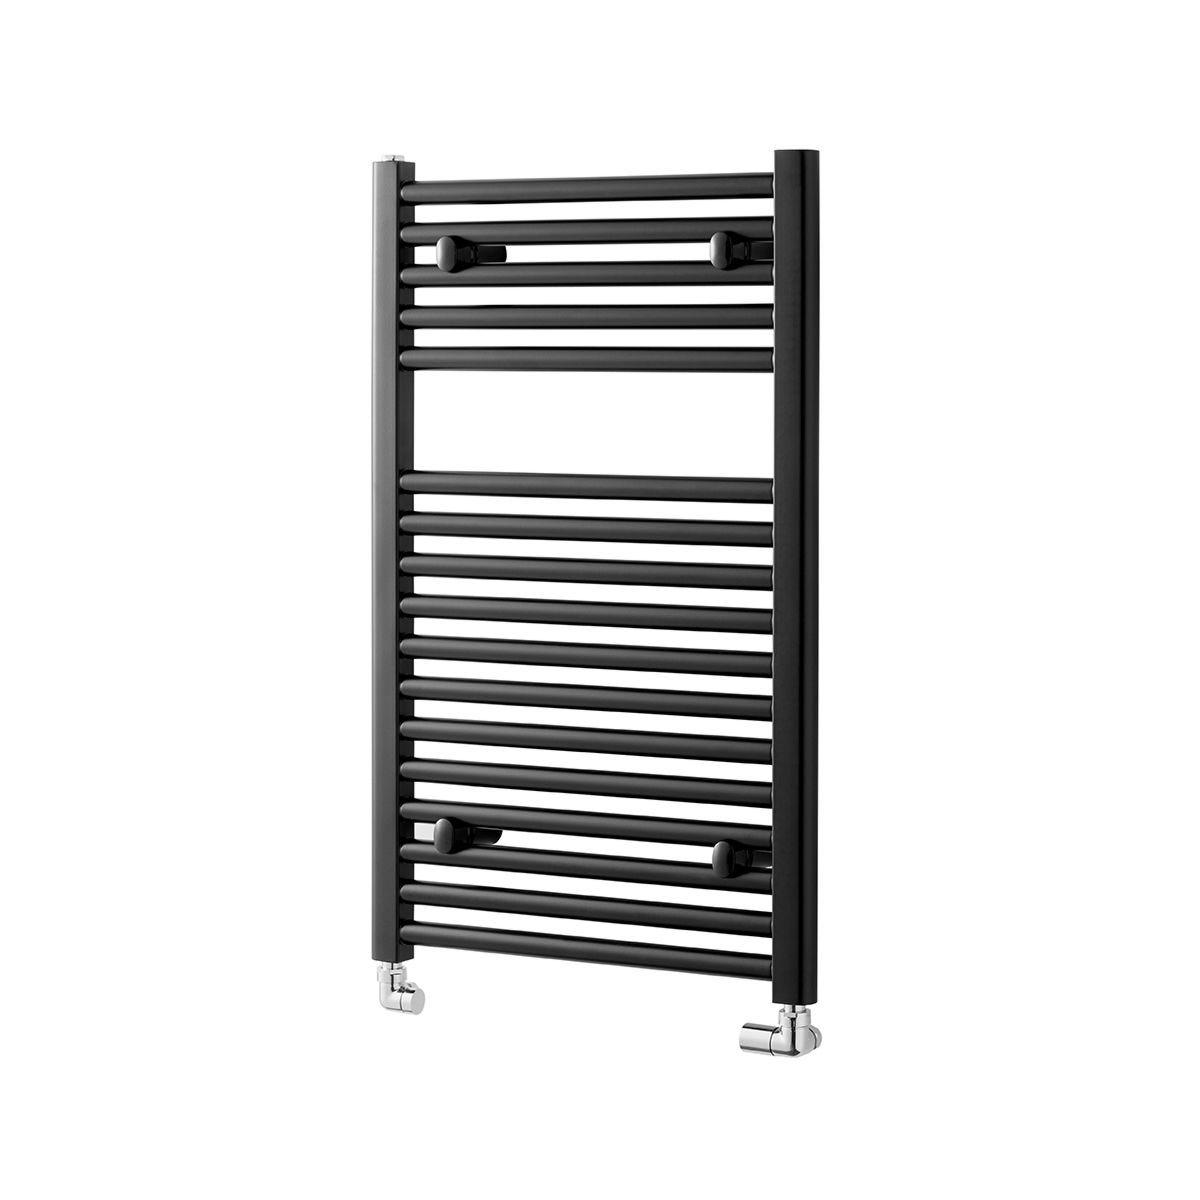 Towelrads Pisa Straight Towel Rail Radiator - Black 1200x600